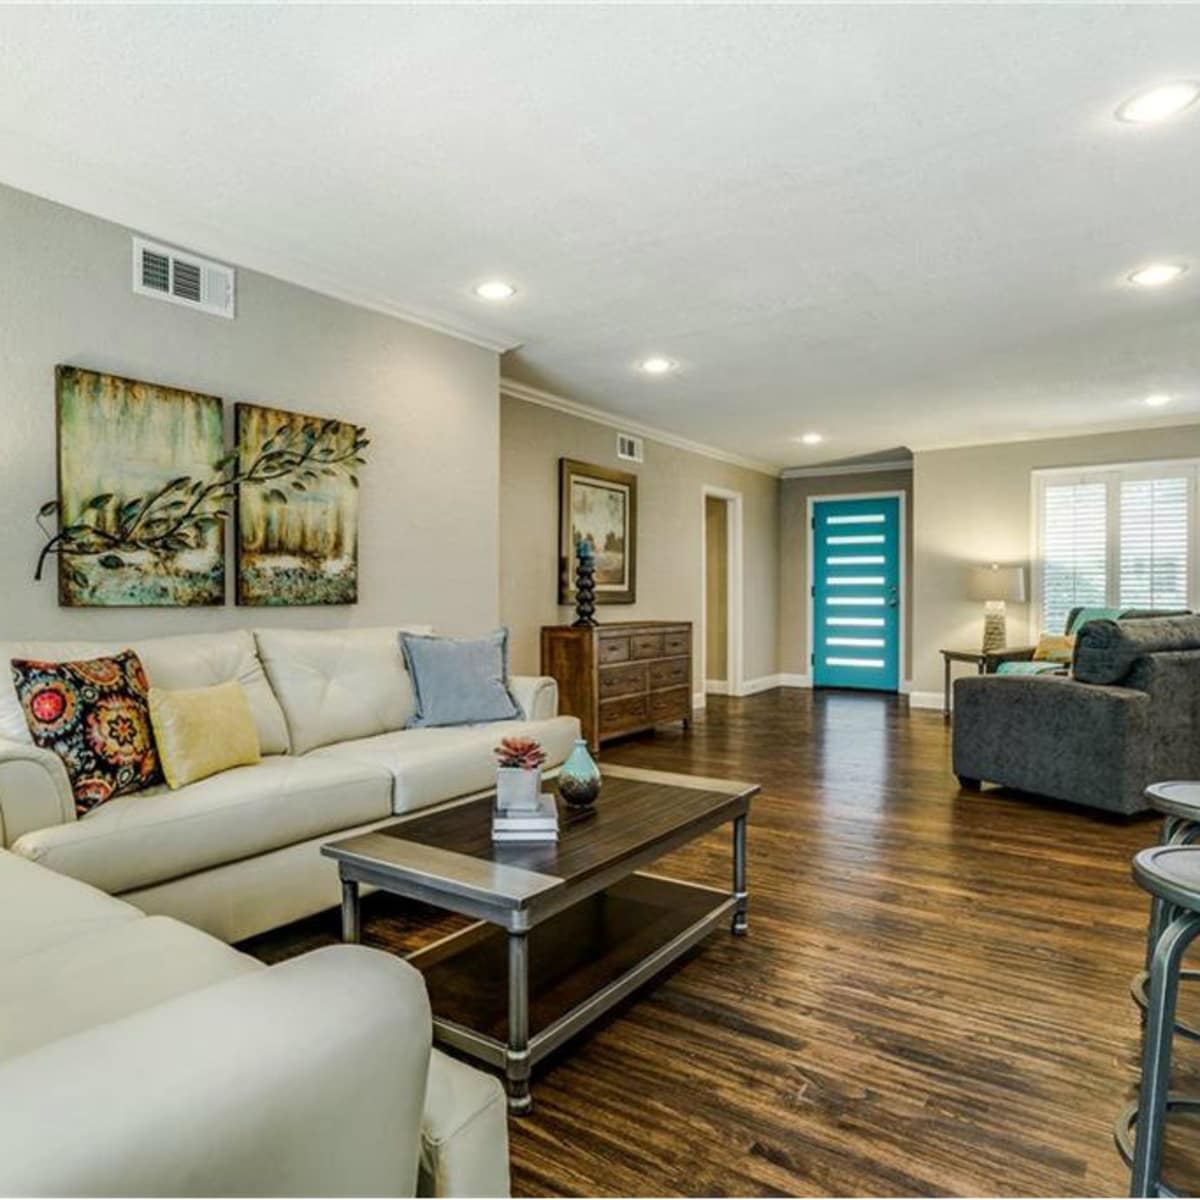 11229 Lanewood Cir living area